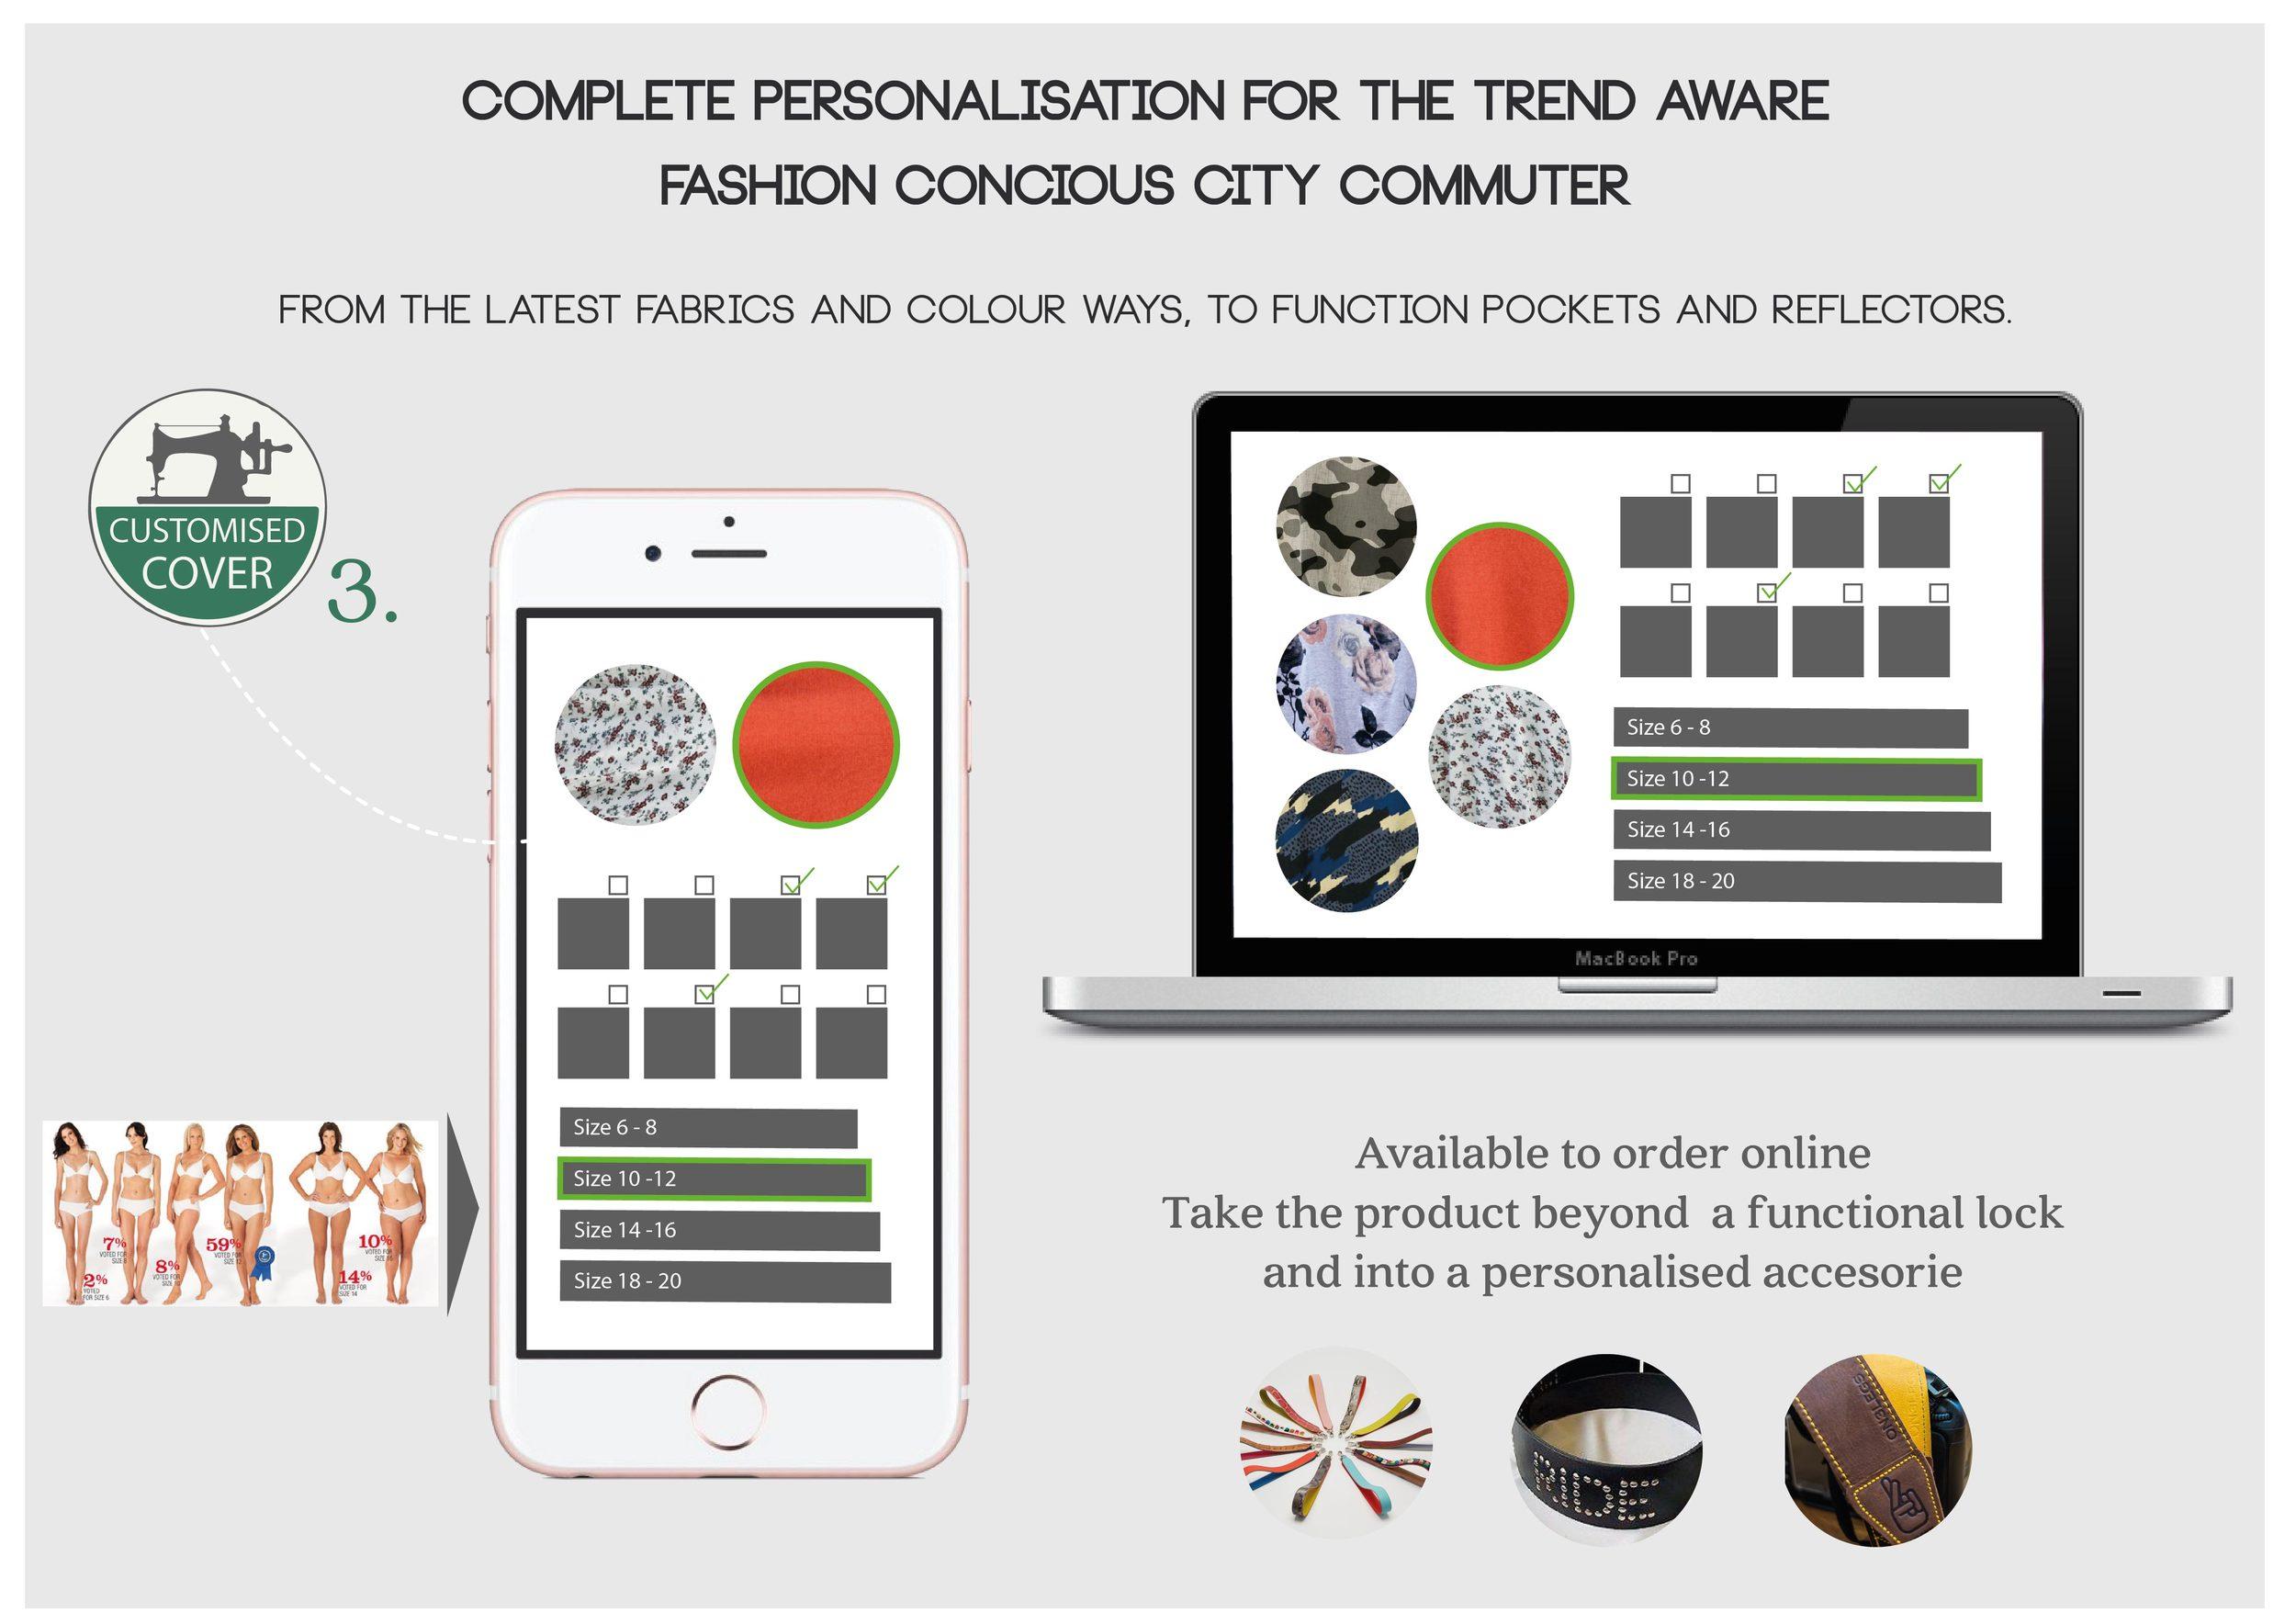 6Product_design_innovation_concept_generation.jpg